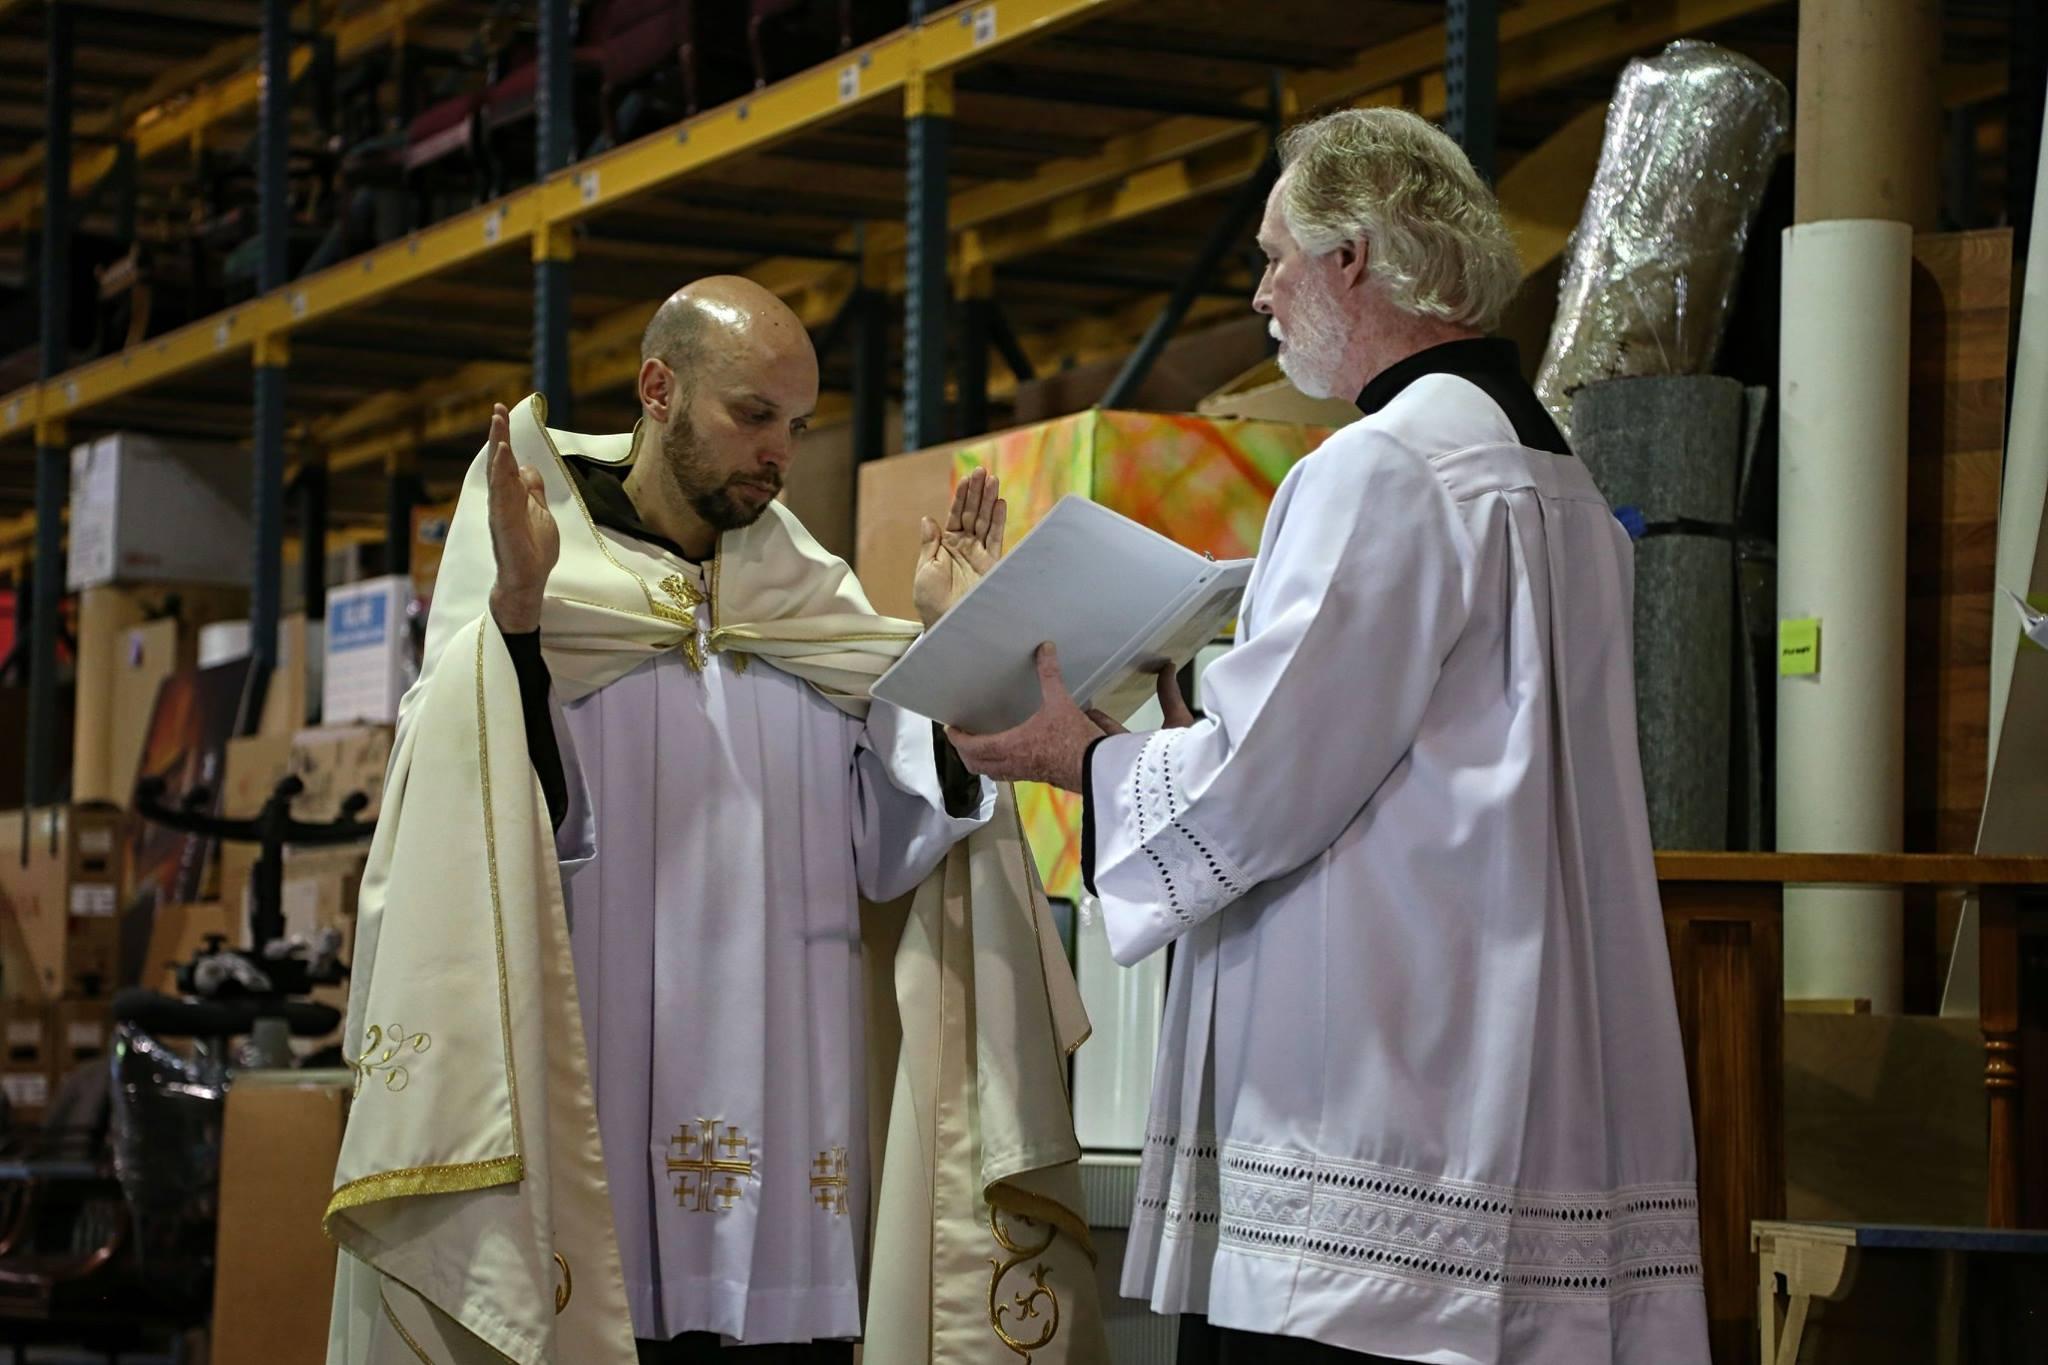 Exposition Sacrament Prayers Blessed